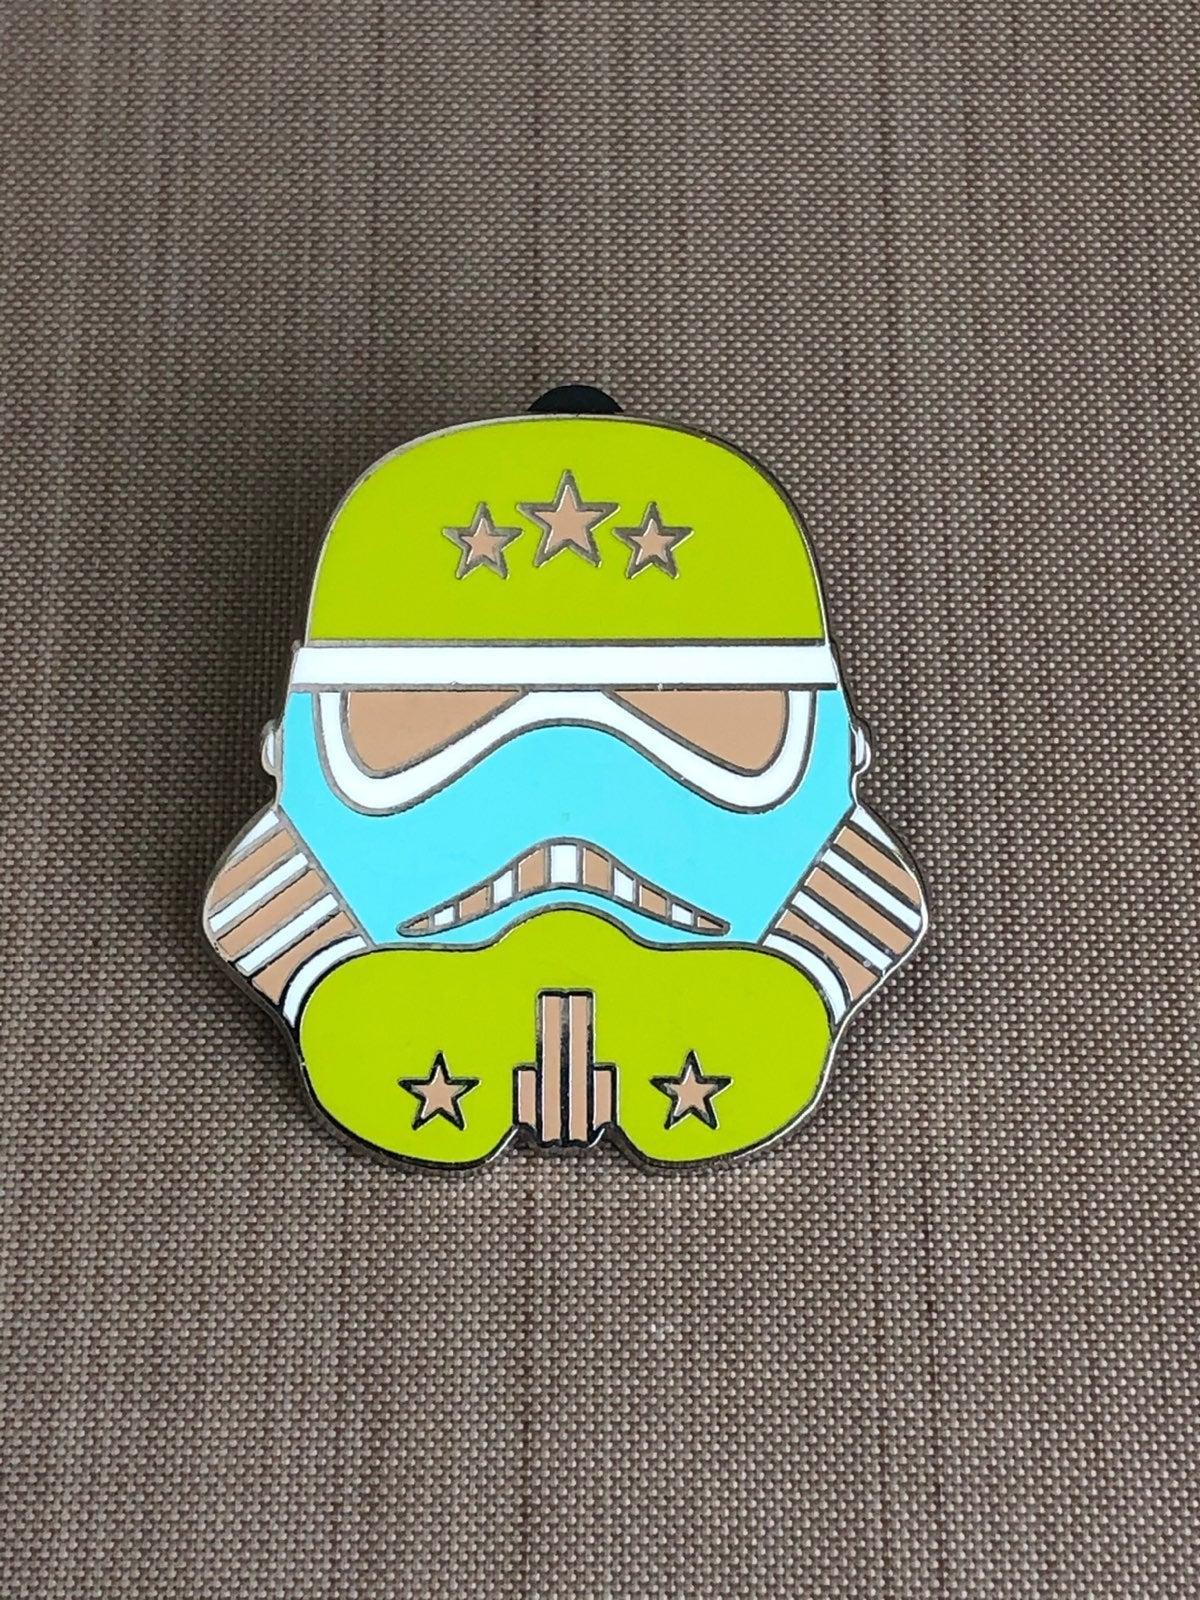 Star Wars Stormtrooper Helmets - Retro S